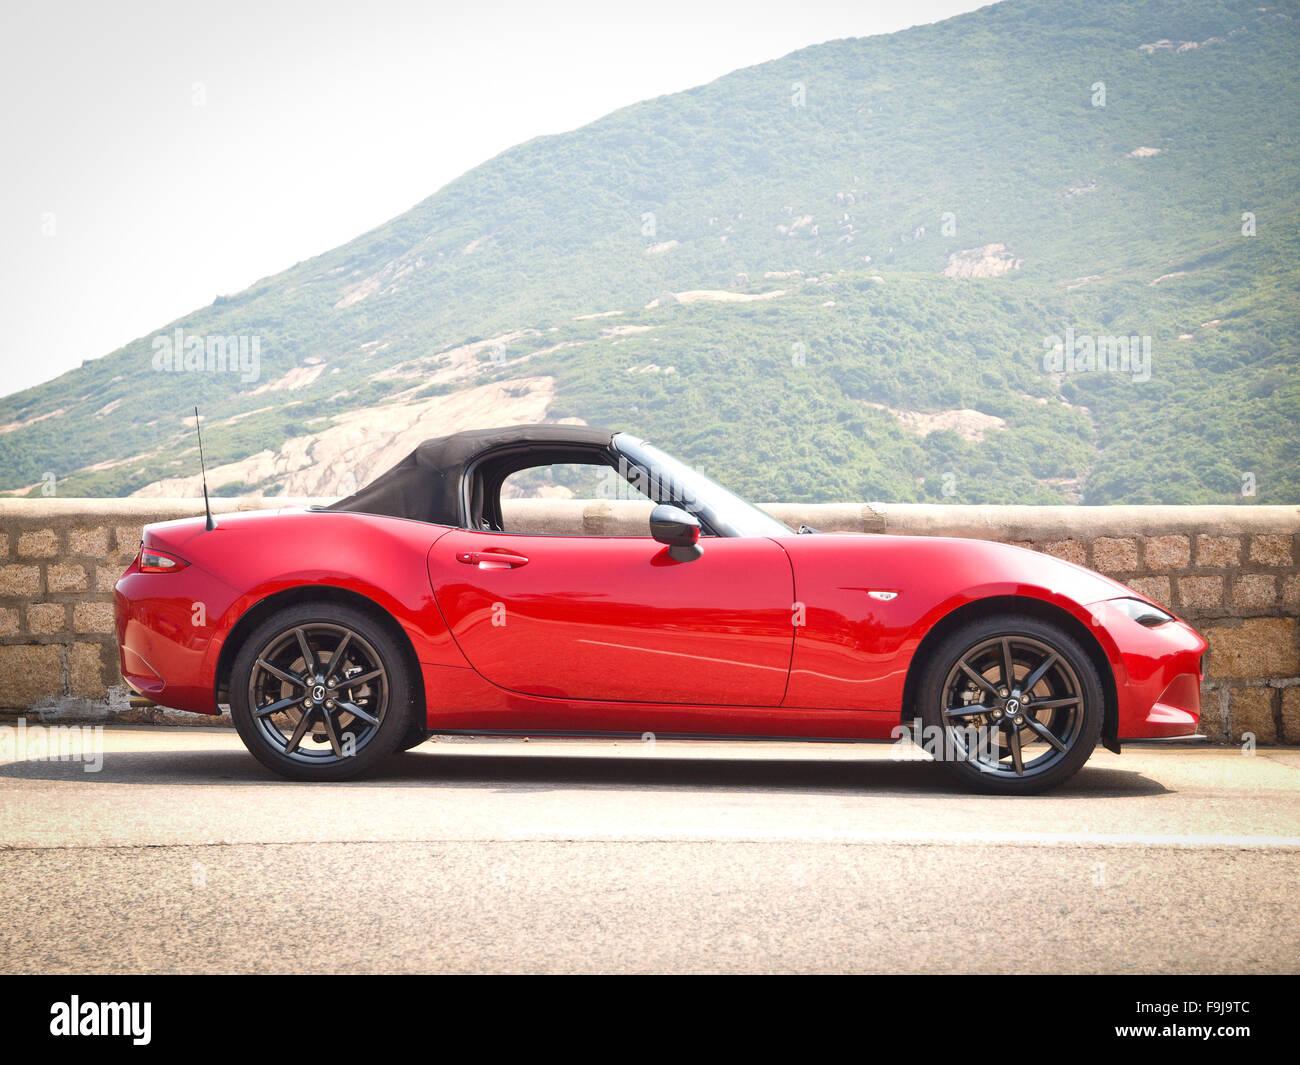 Kelebihan Mazda Mx5 2015 Top Model Tahun Ini